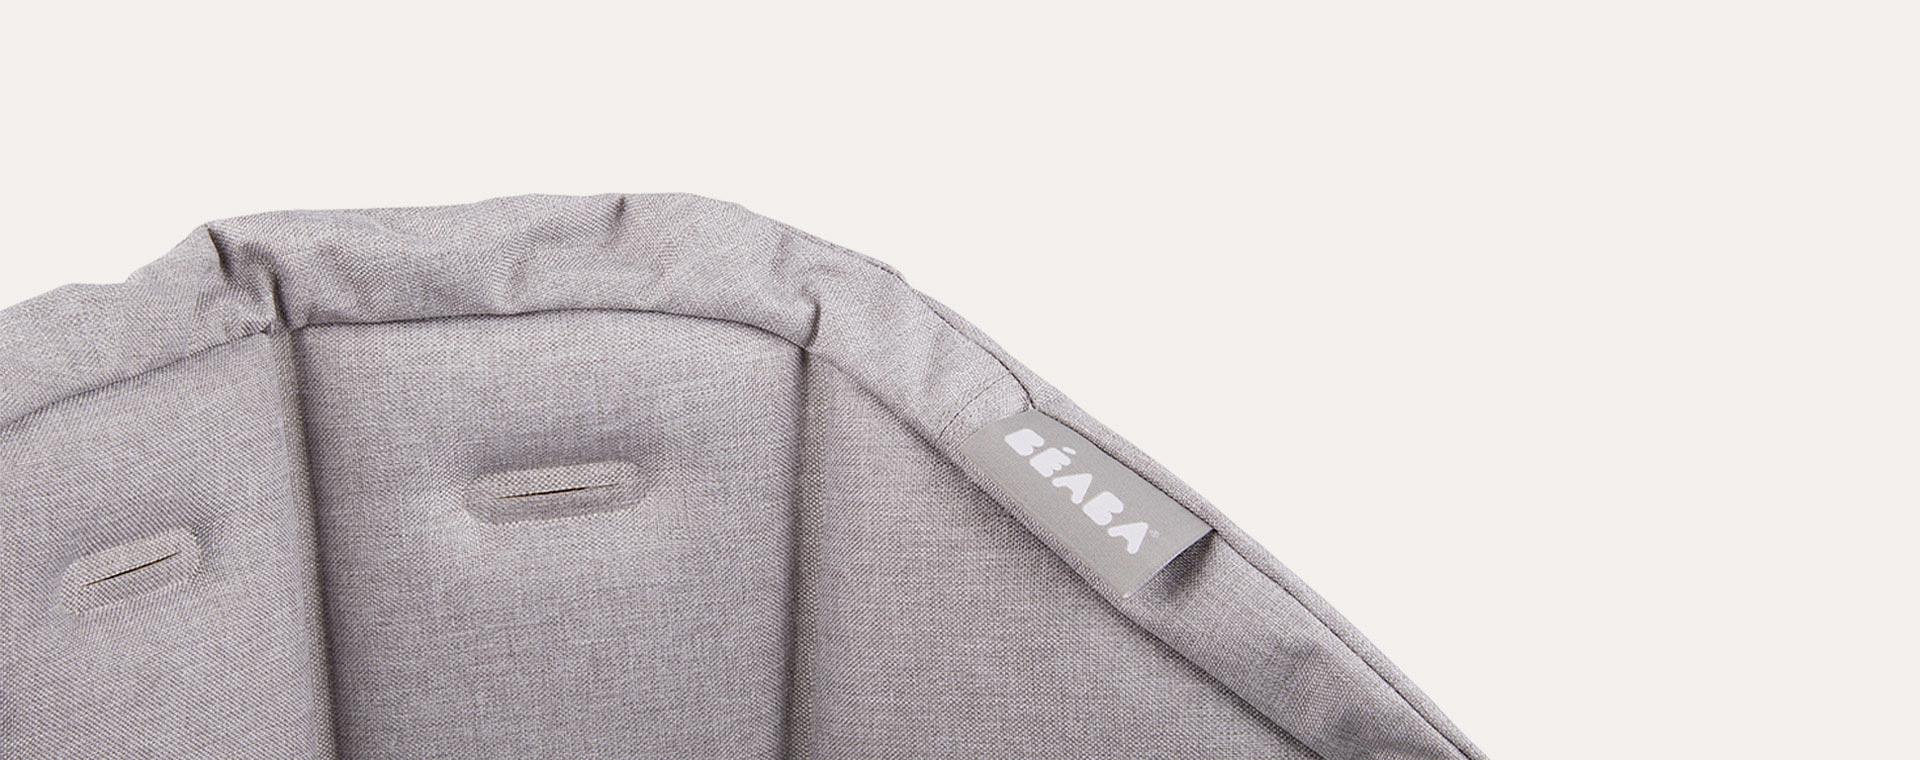 Grey Beaba Beaba Seat Cushion Cover